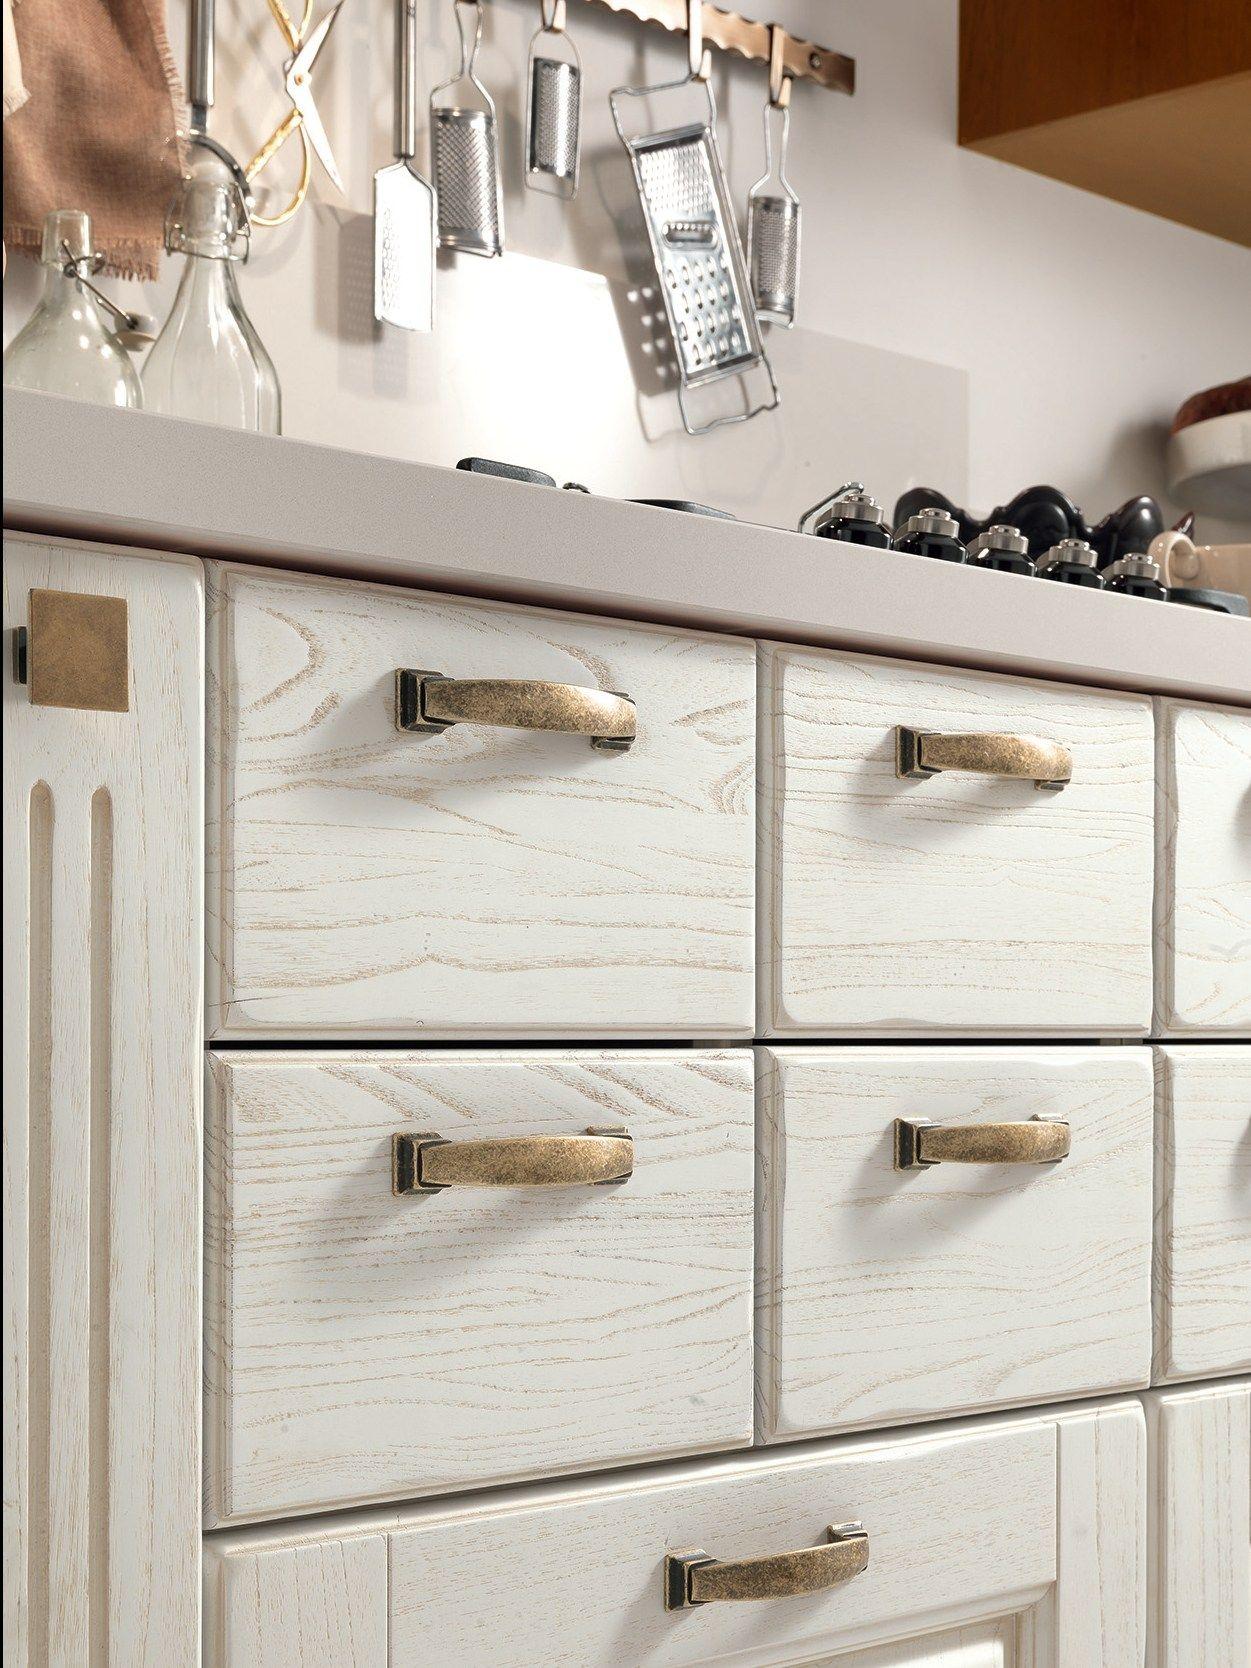 maniglie per mobili da cucina : Cucina in legno con maniglie LAURA ...